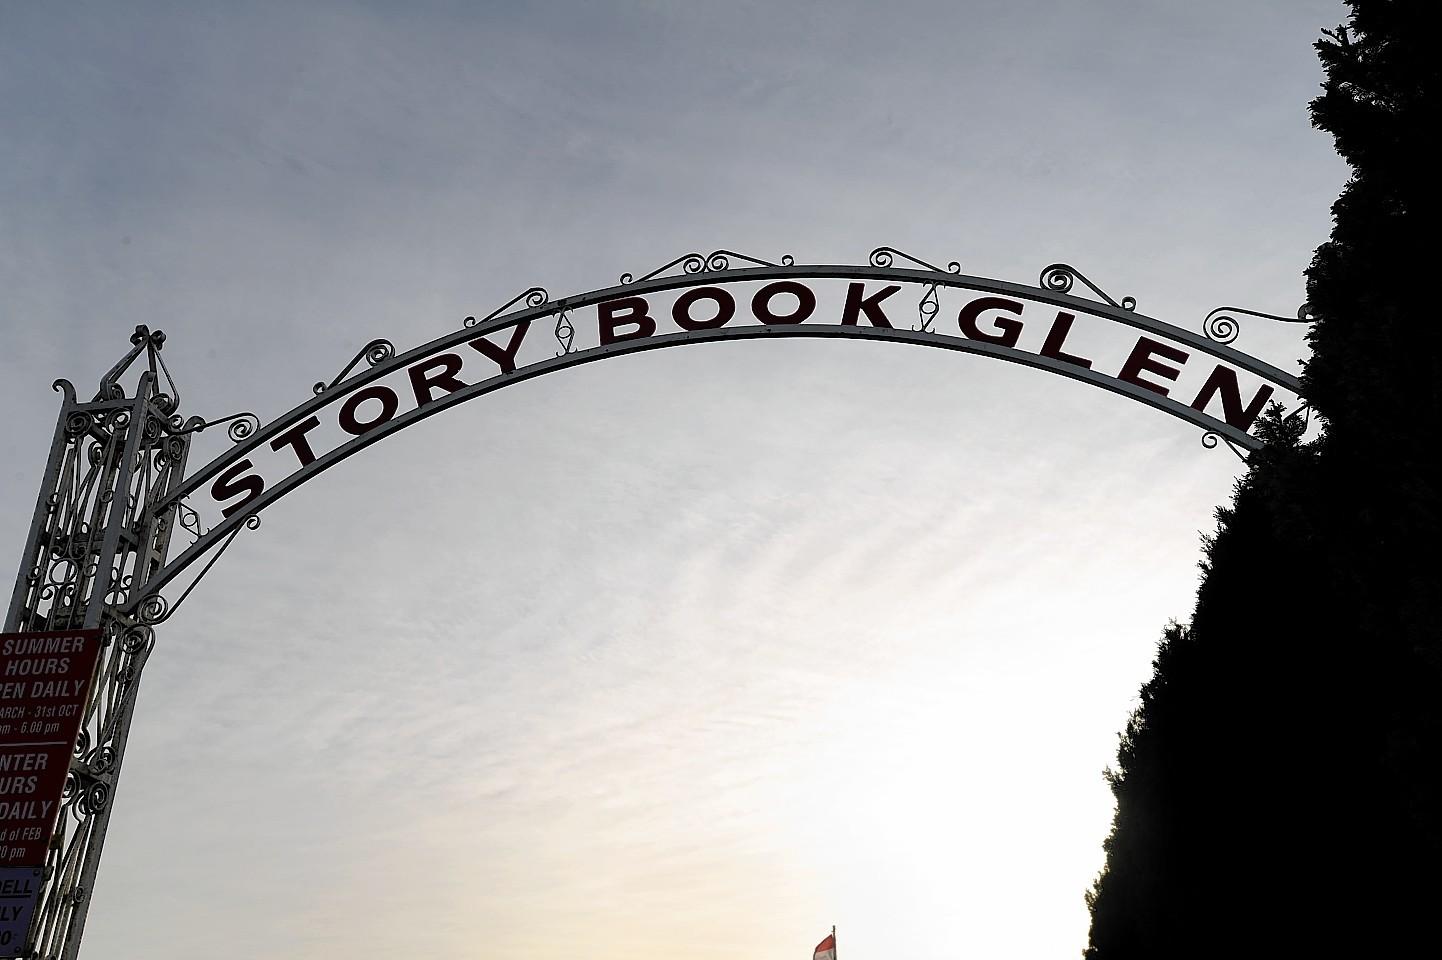 Storybook-Glen.jpg